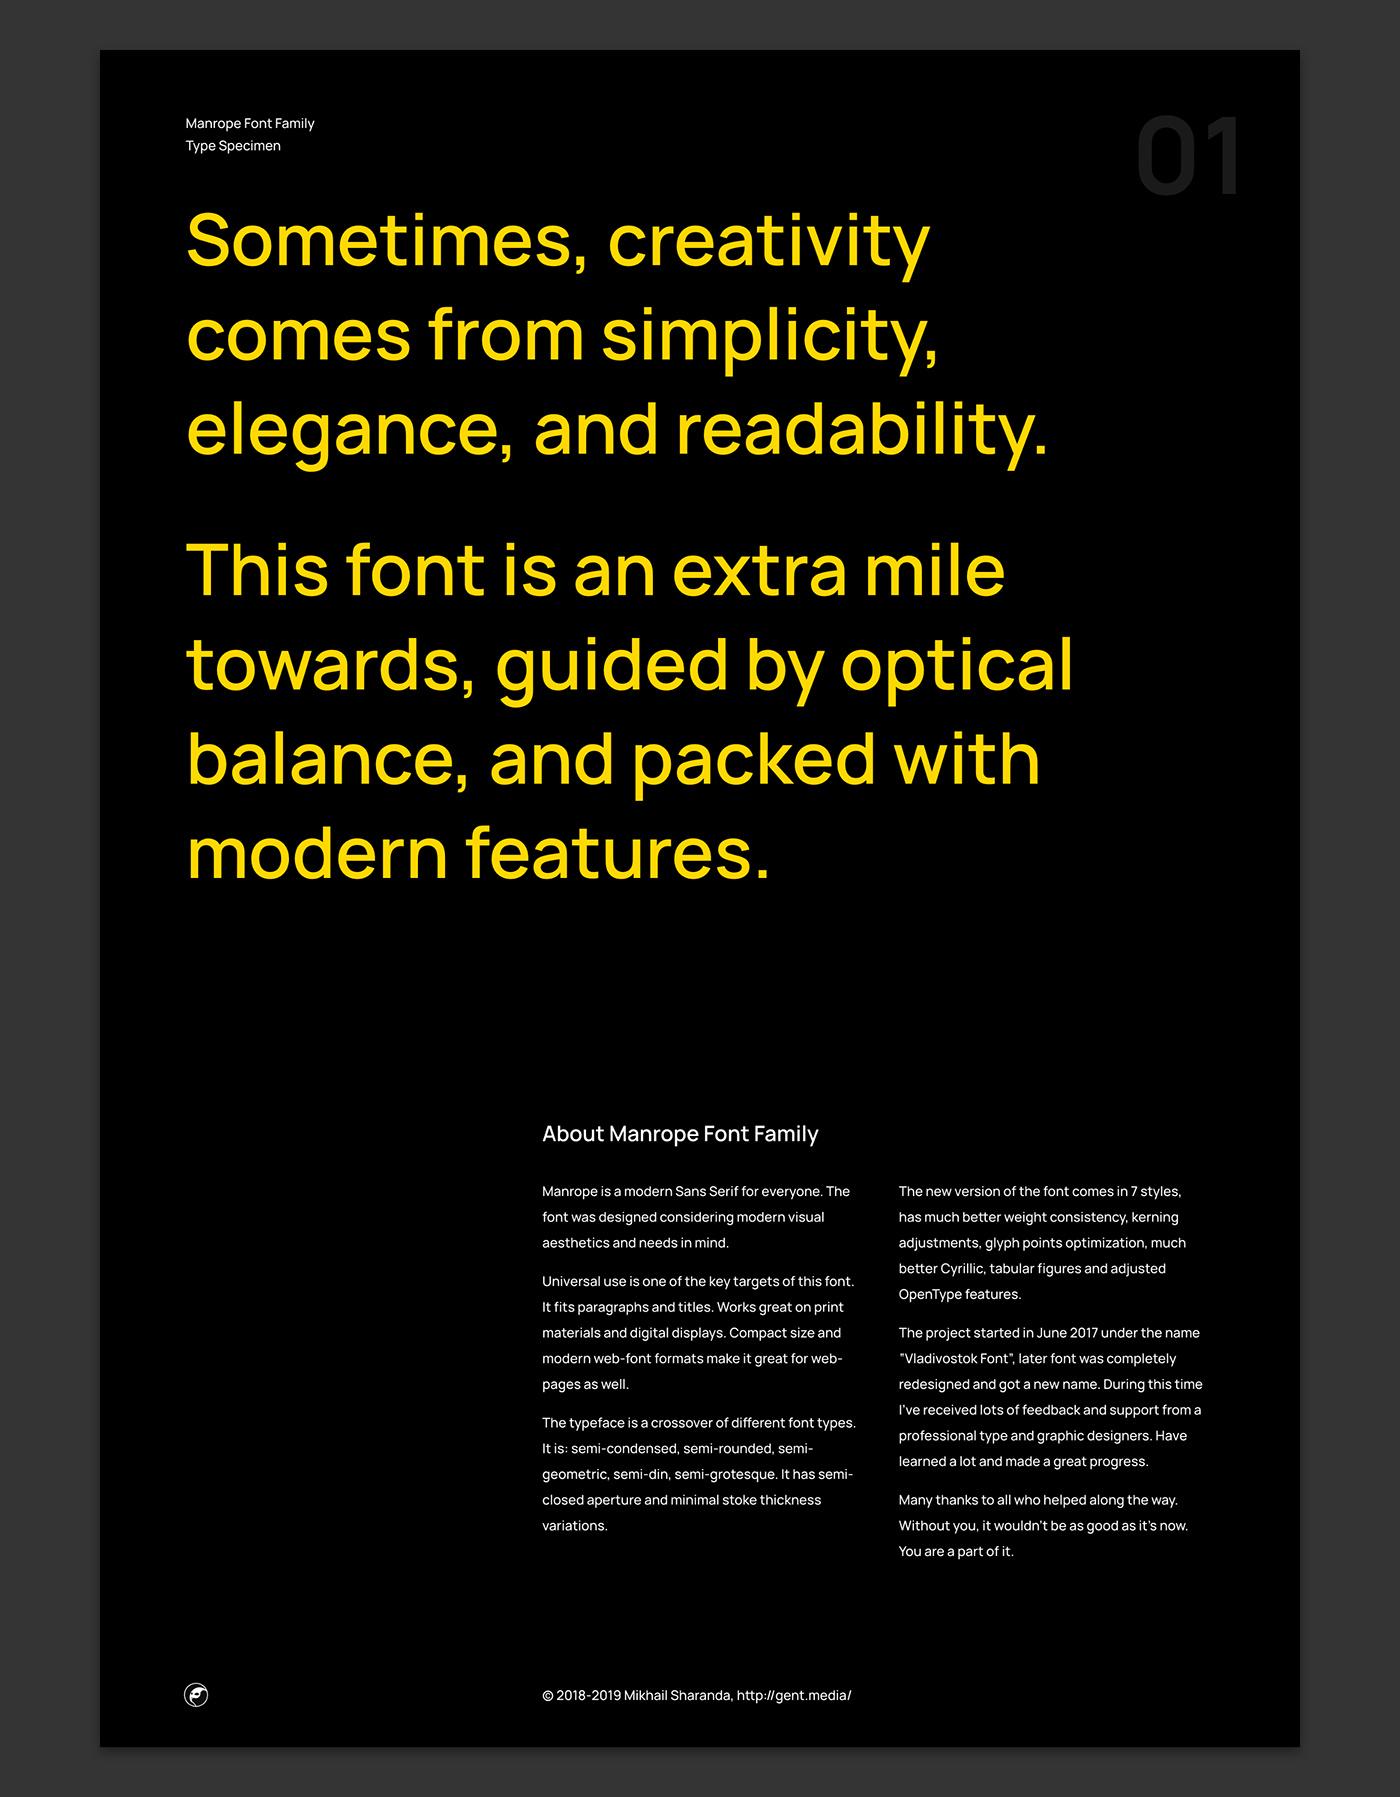 Manrope: A modern, geometric sans-serif typeface